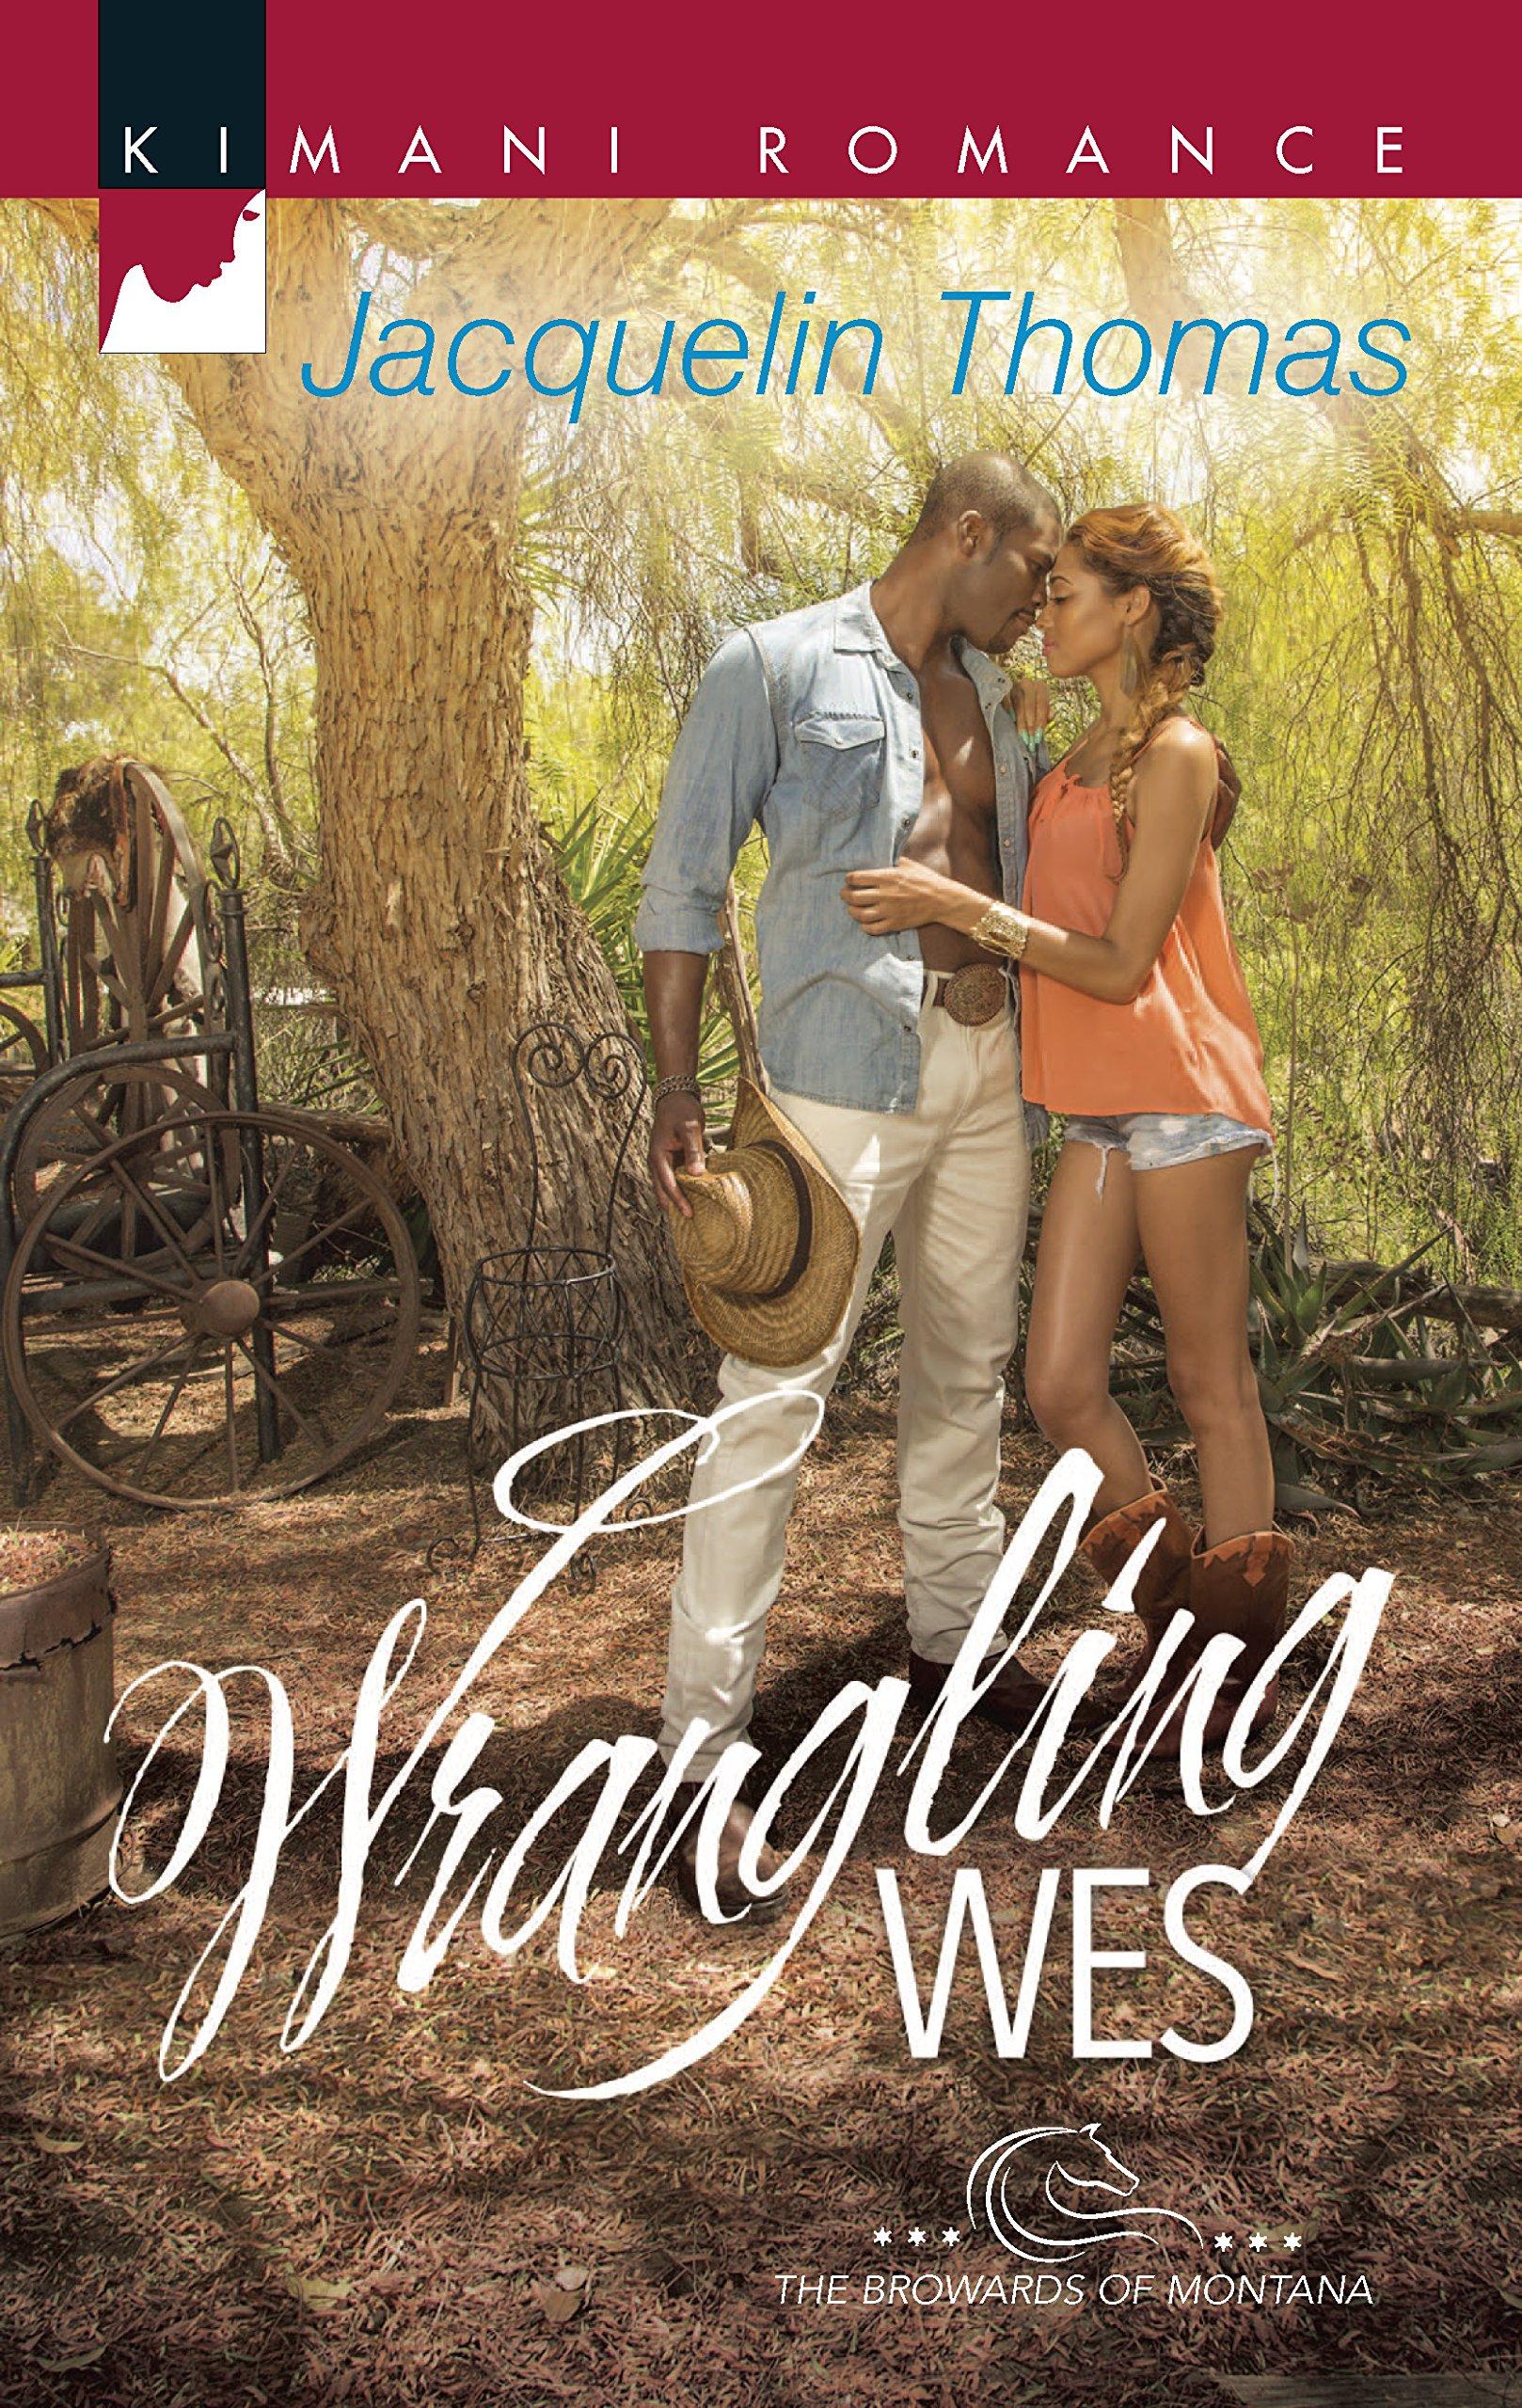 Amazon.com: Wrangling Wes (The Browards of Montana) (9780373863495):  Jacquelin Thomas: Books